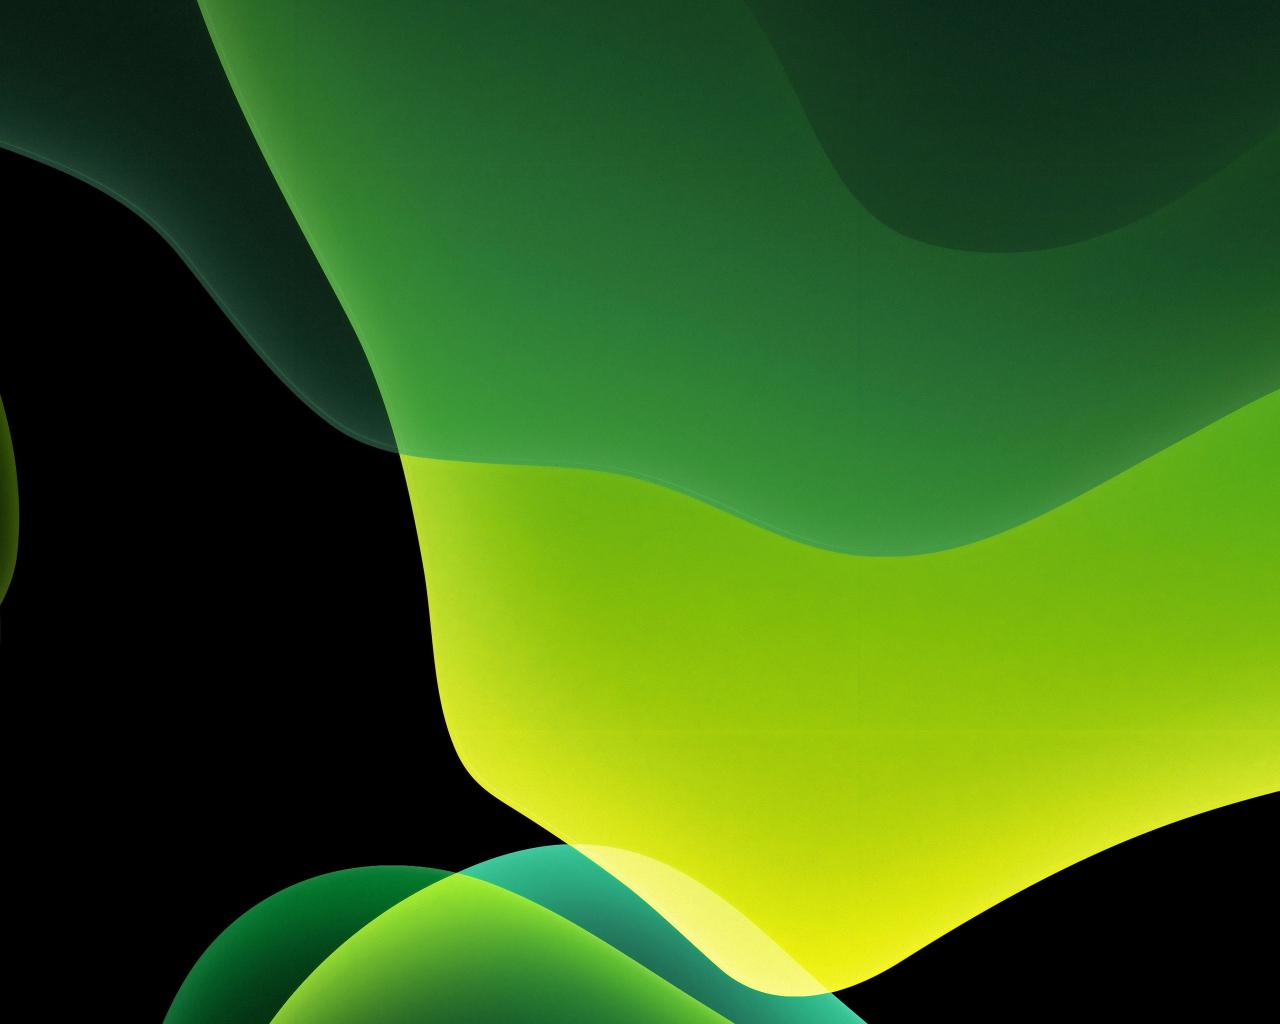 1280x1024 Green Ios 13 Abstract Dark 1280x1024 Resolution